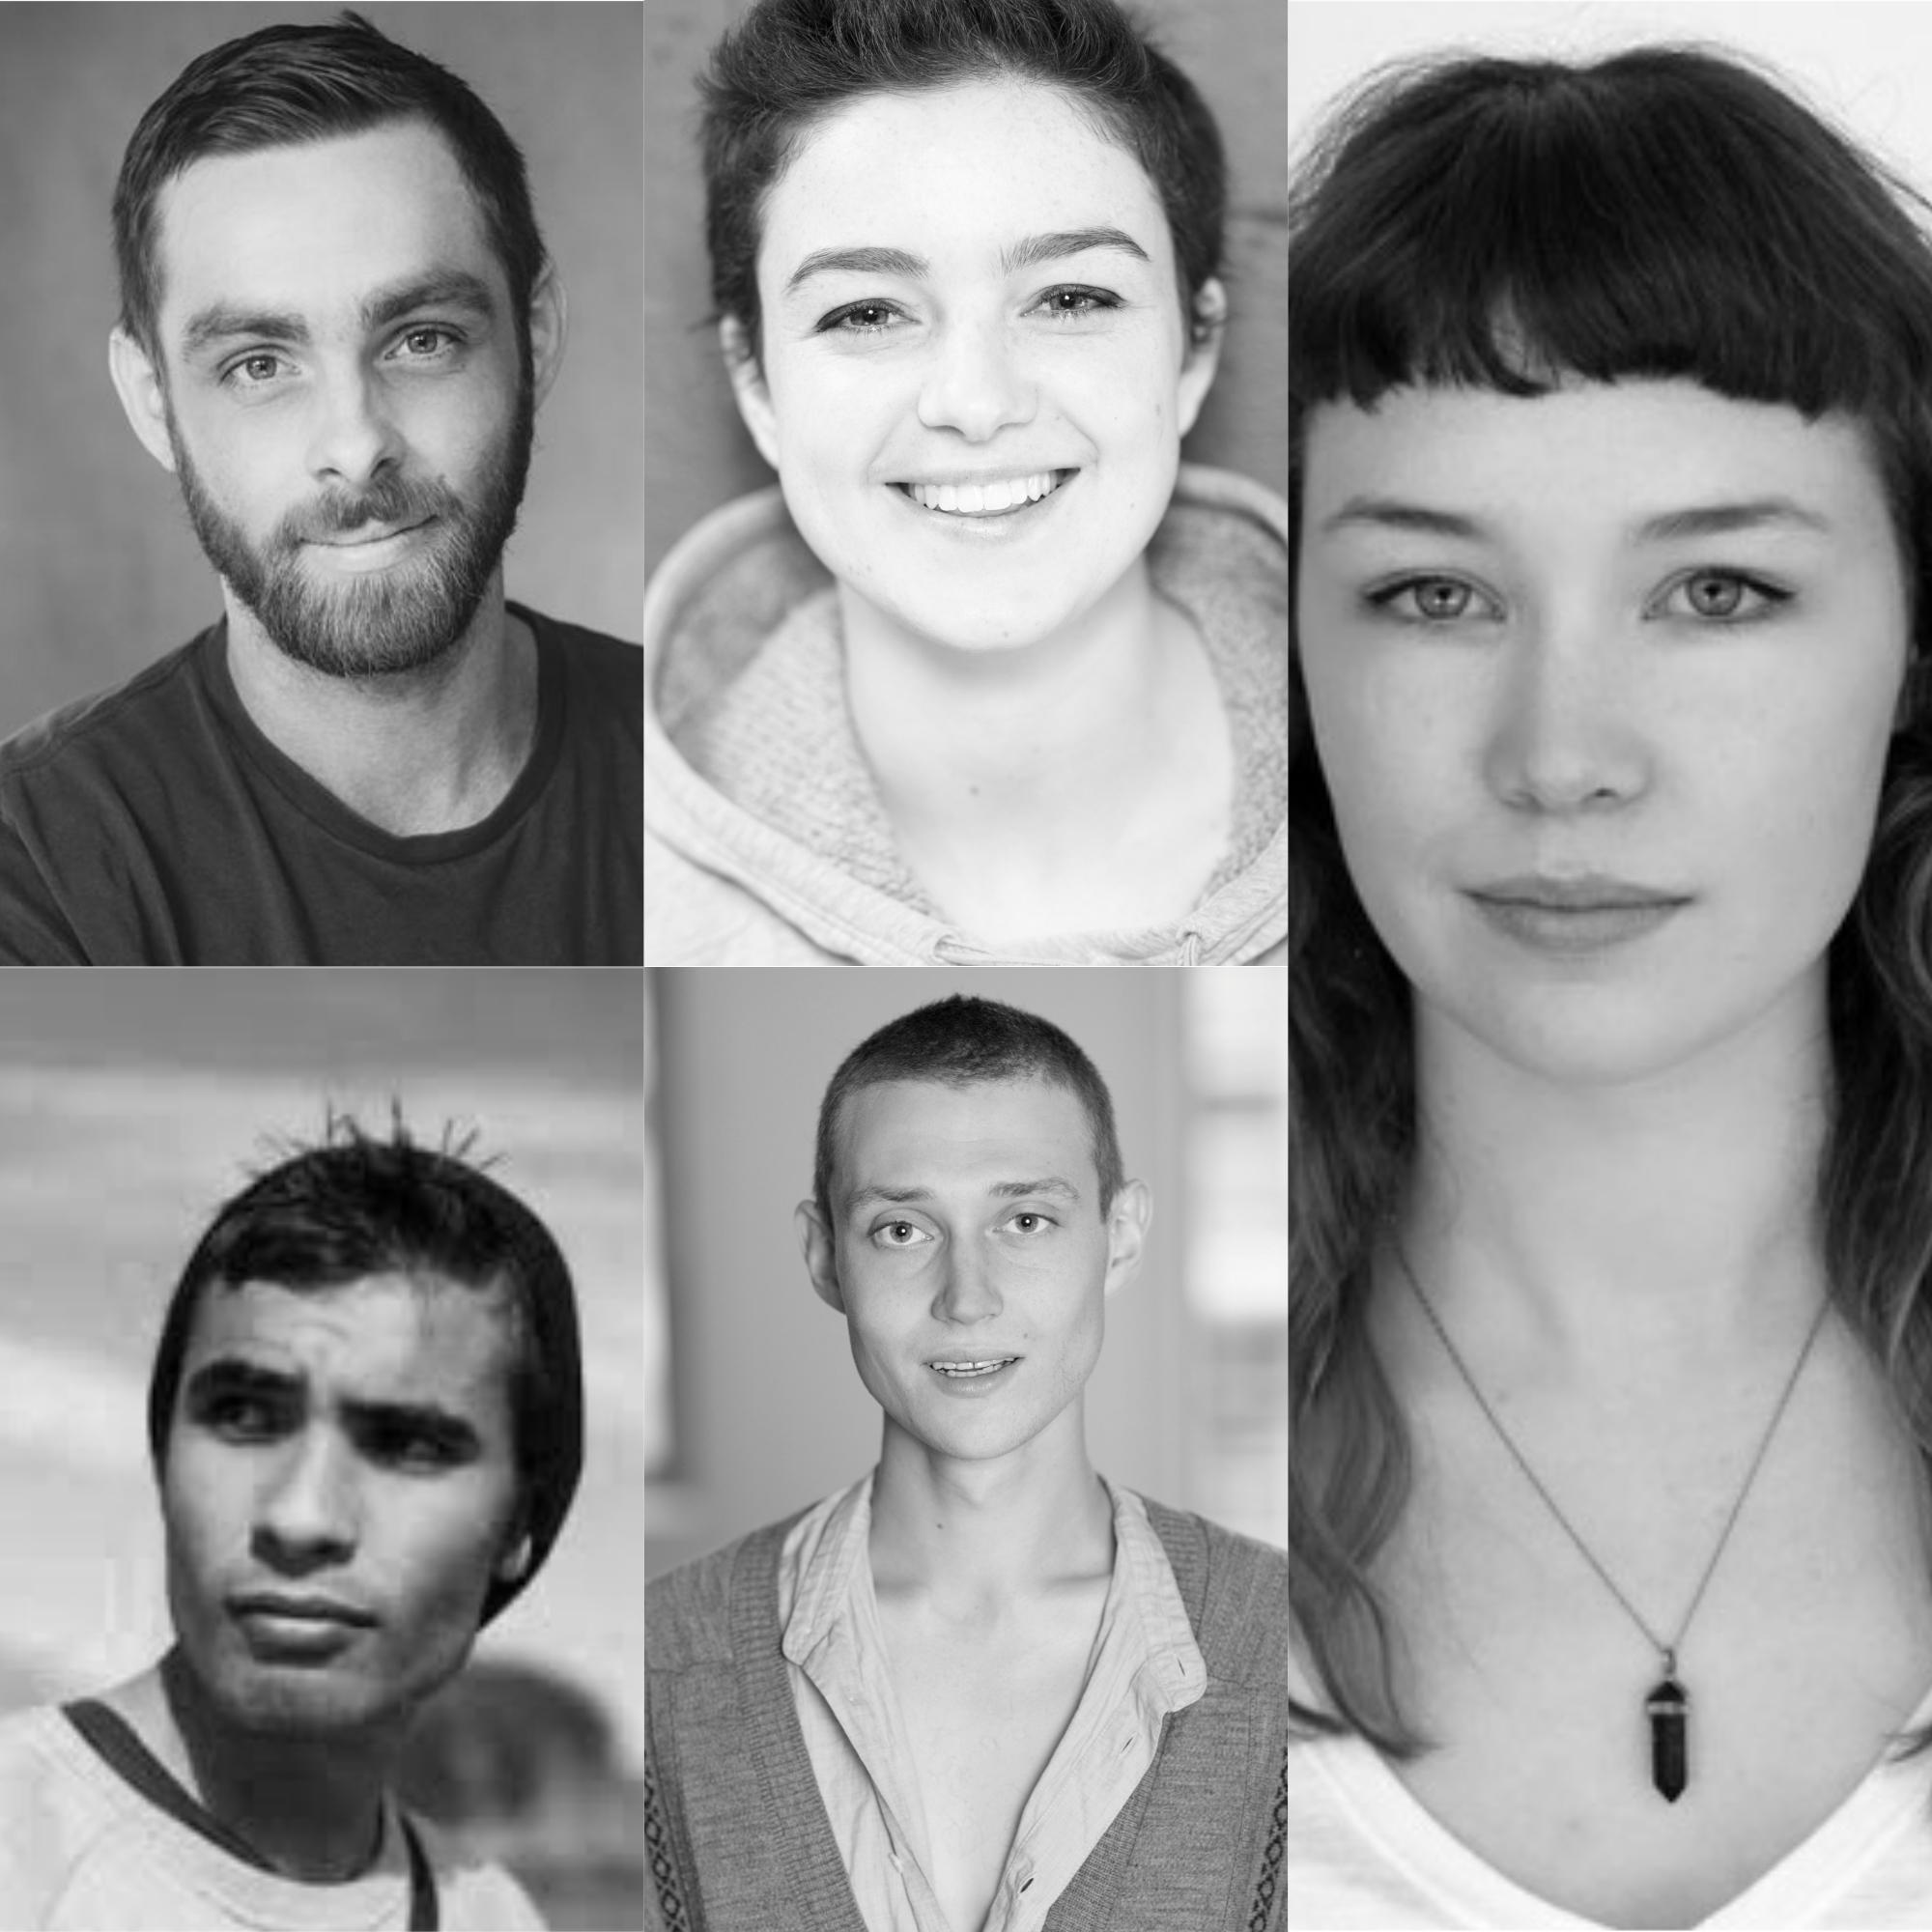 From top left: Tom Clarke, Ingrid Saker, Brynne Tasker-Poland, George Fenn, Owen McCarthy